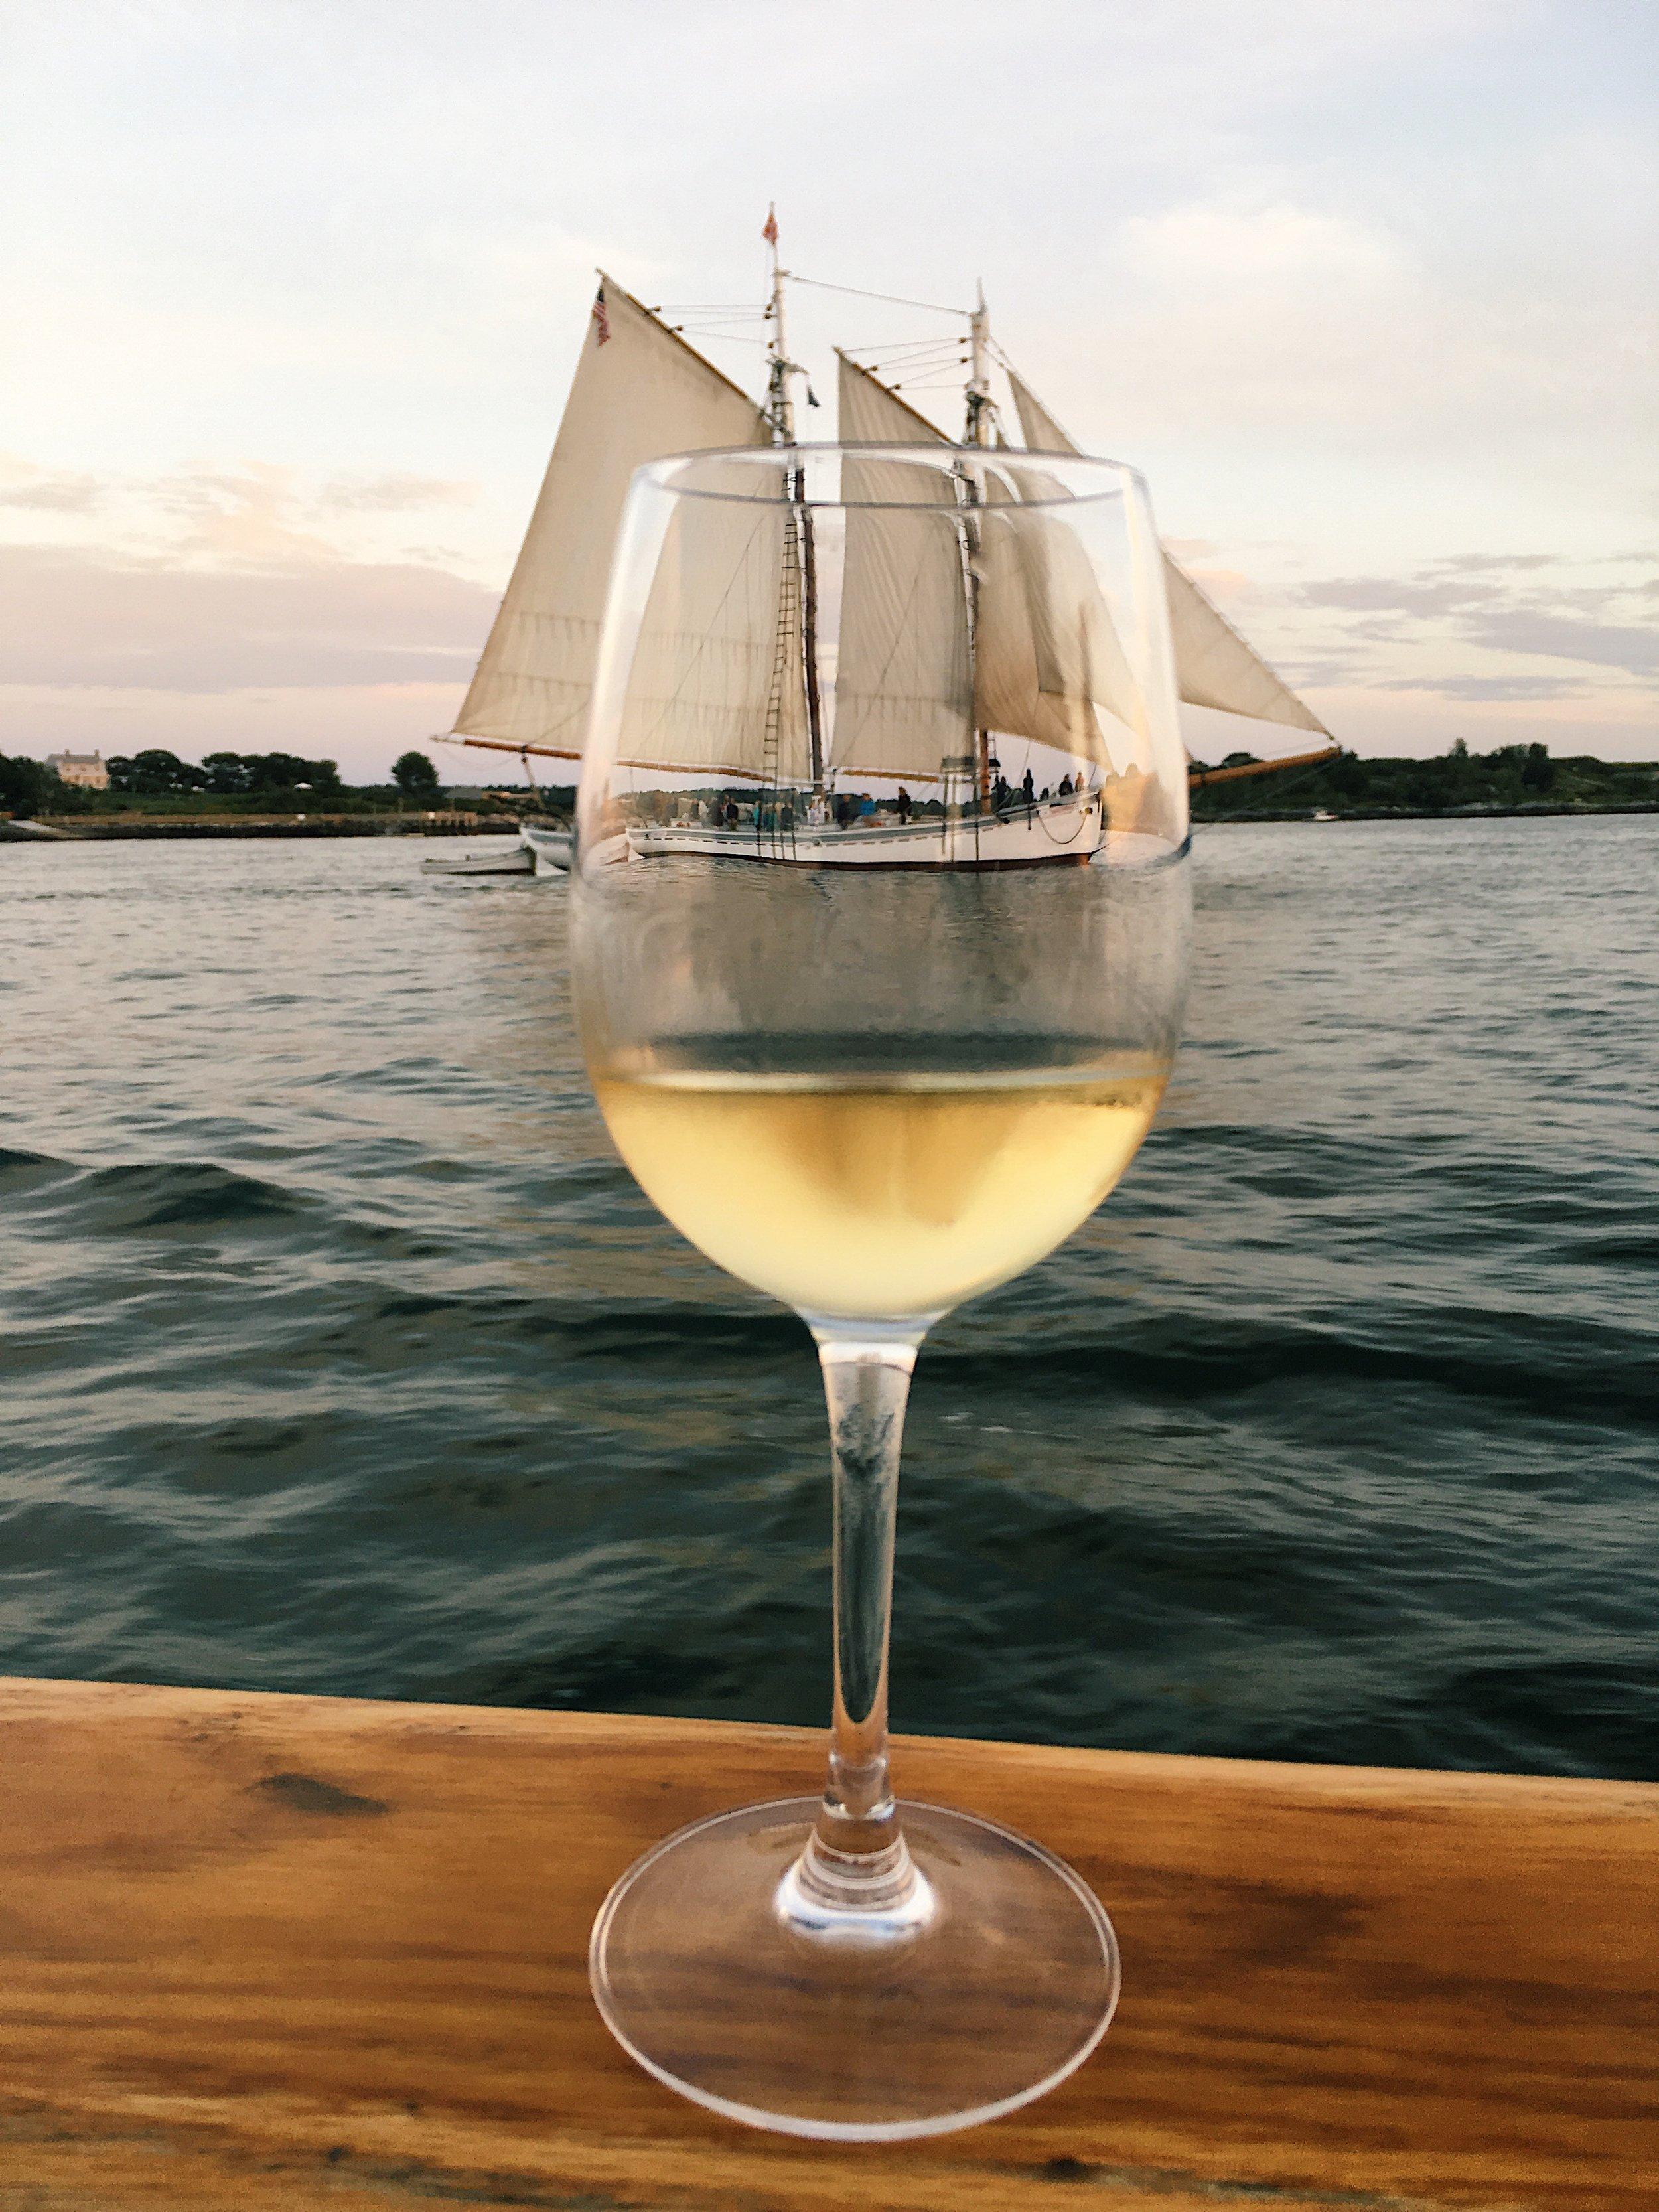 wine_wise_events_portland_maine_wine_sailwine_wise_events_portland_maine_wine_sailwine-wine-portland-maine-sail-white.jpg